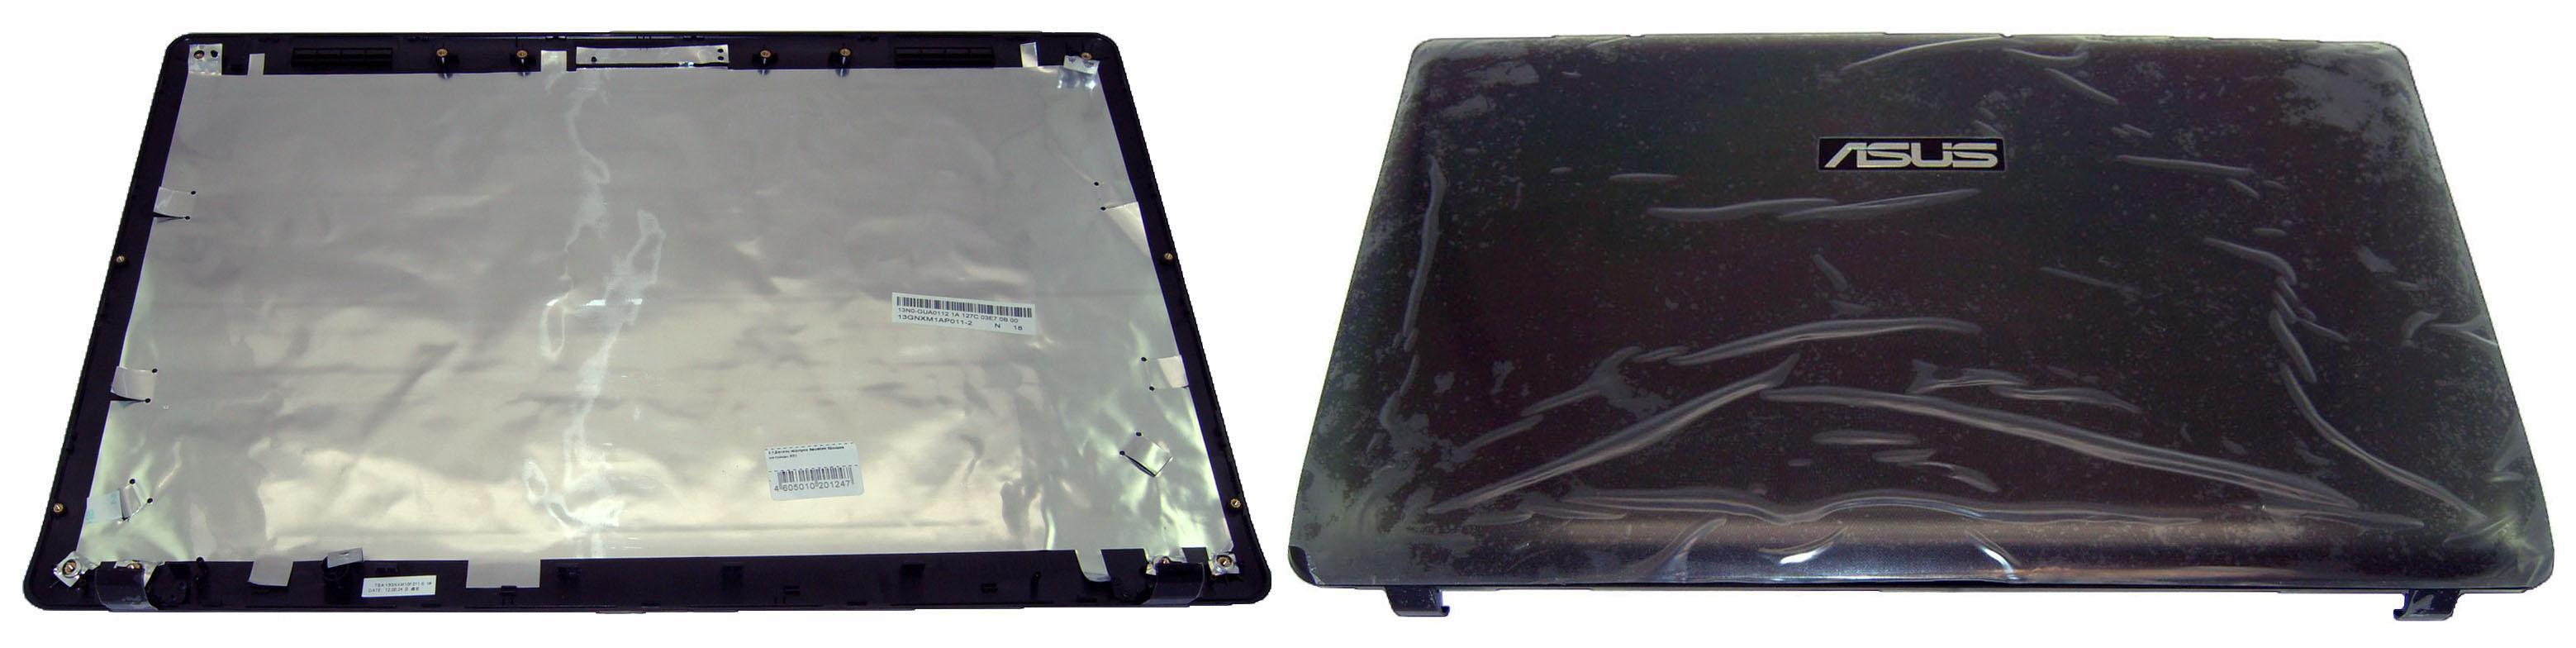 Крышка матрицы для ноутбука Asus K52